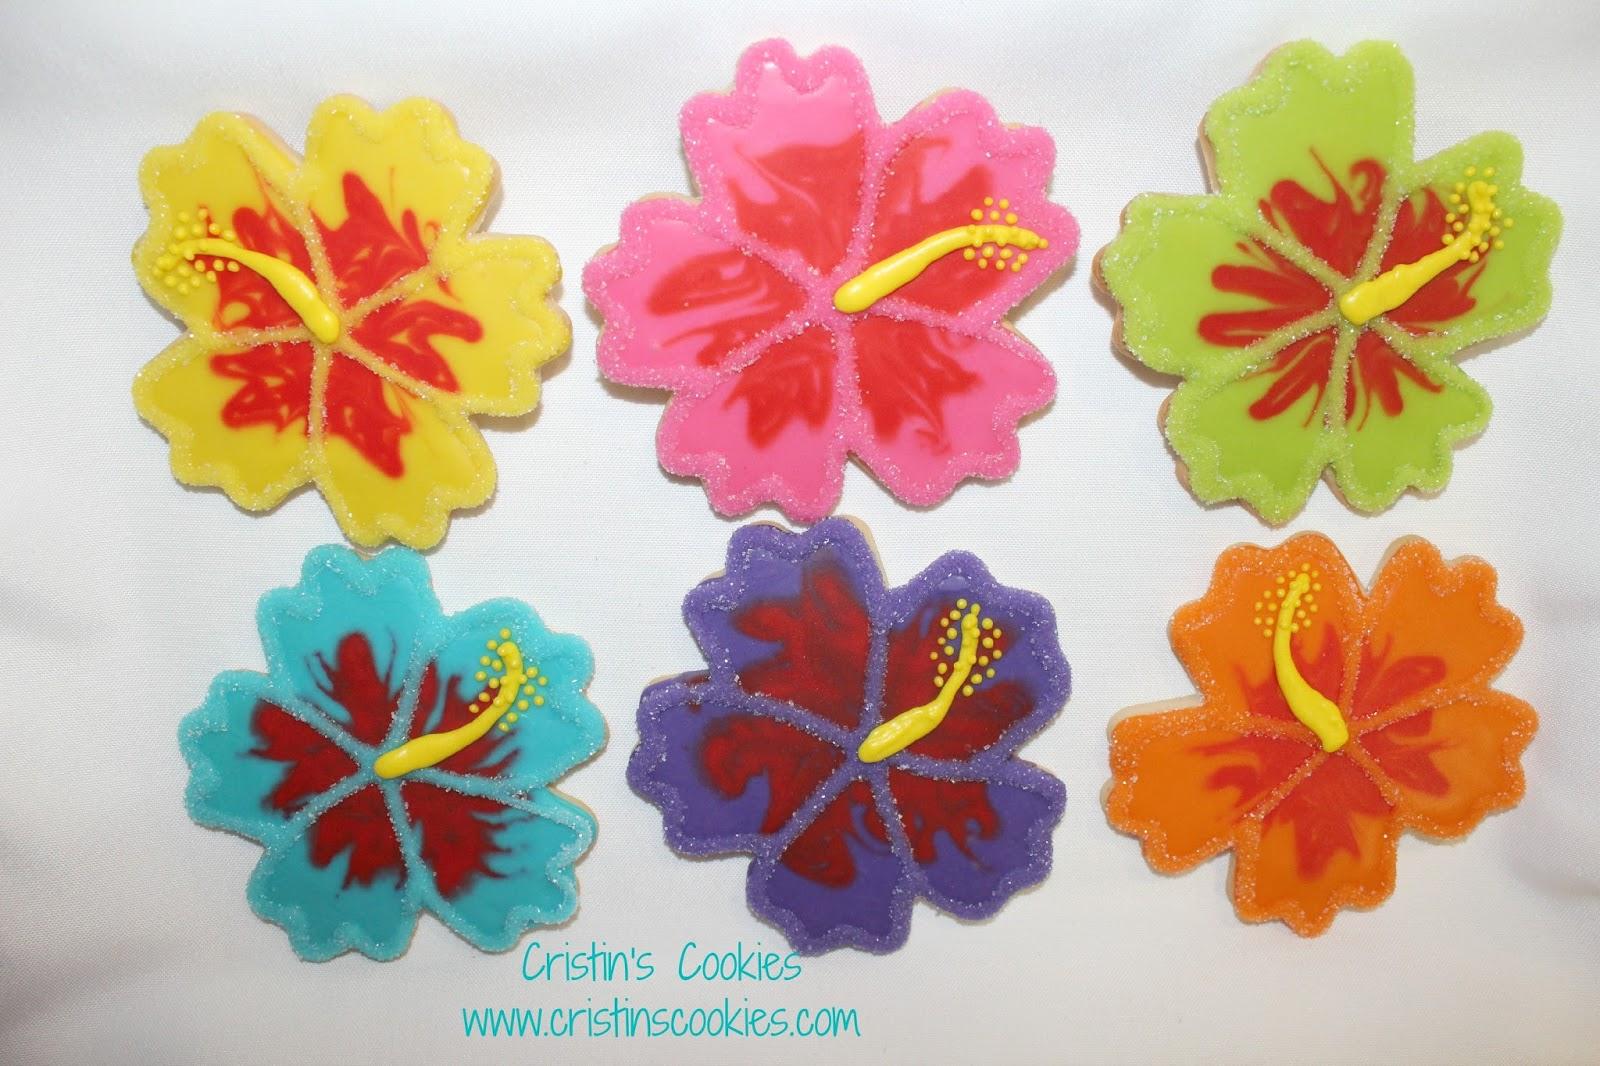 Cristins cookies hibiscus hula girls and free printable cookie hibiscus hula girls and free printable cookie tags too izmirmasajfo